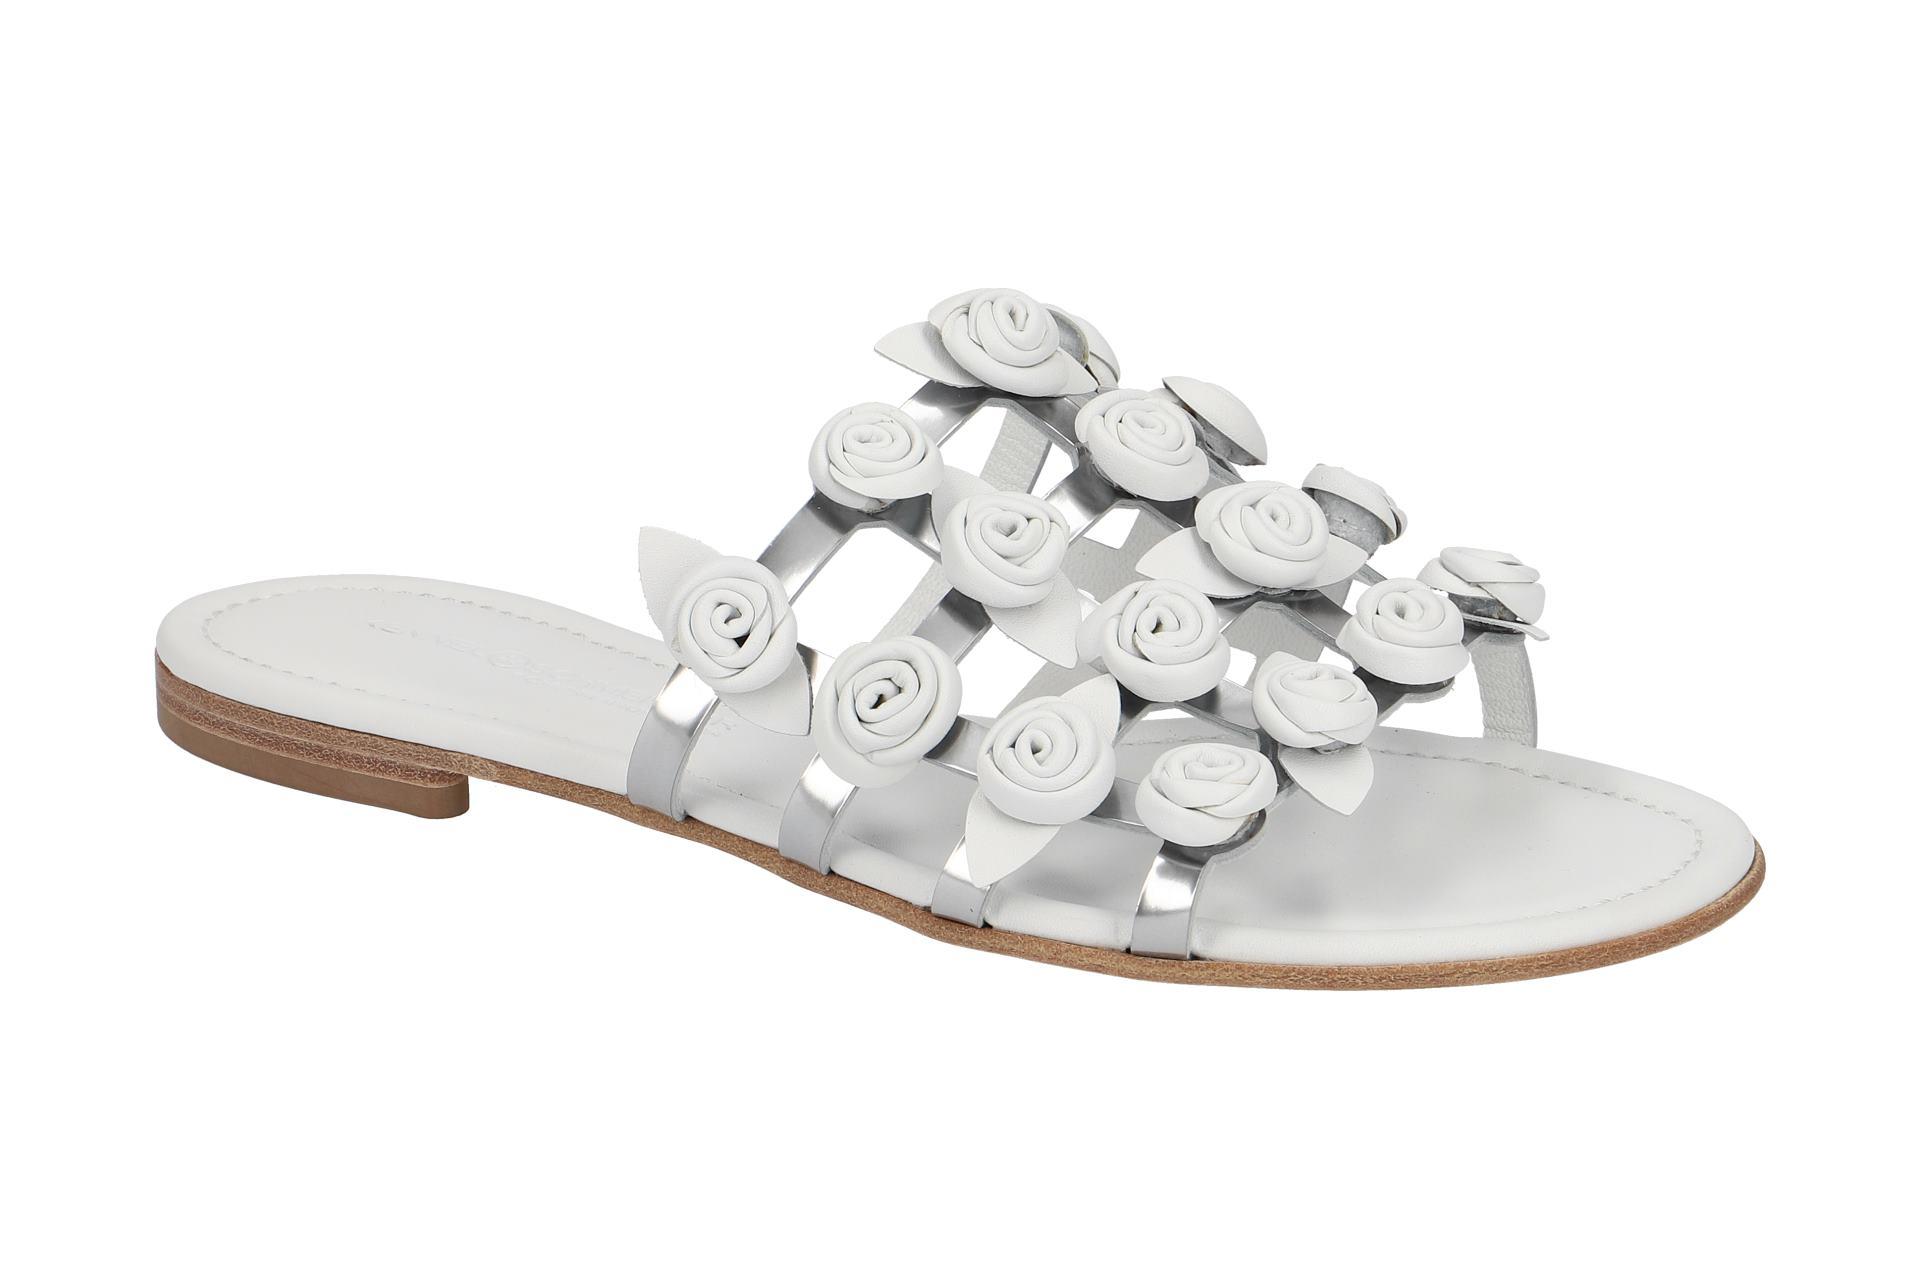 K&S Elle Pantolette grau metallic Freies Verschiffen 100% Original Erschwinglicher Günstiger Preis Bulk-Design Outlet Kollektionen gqQtpr6djT